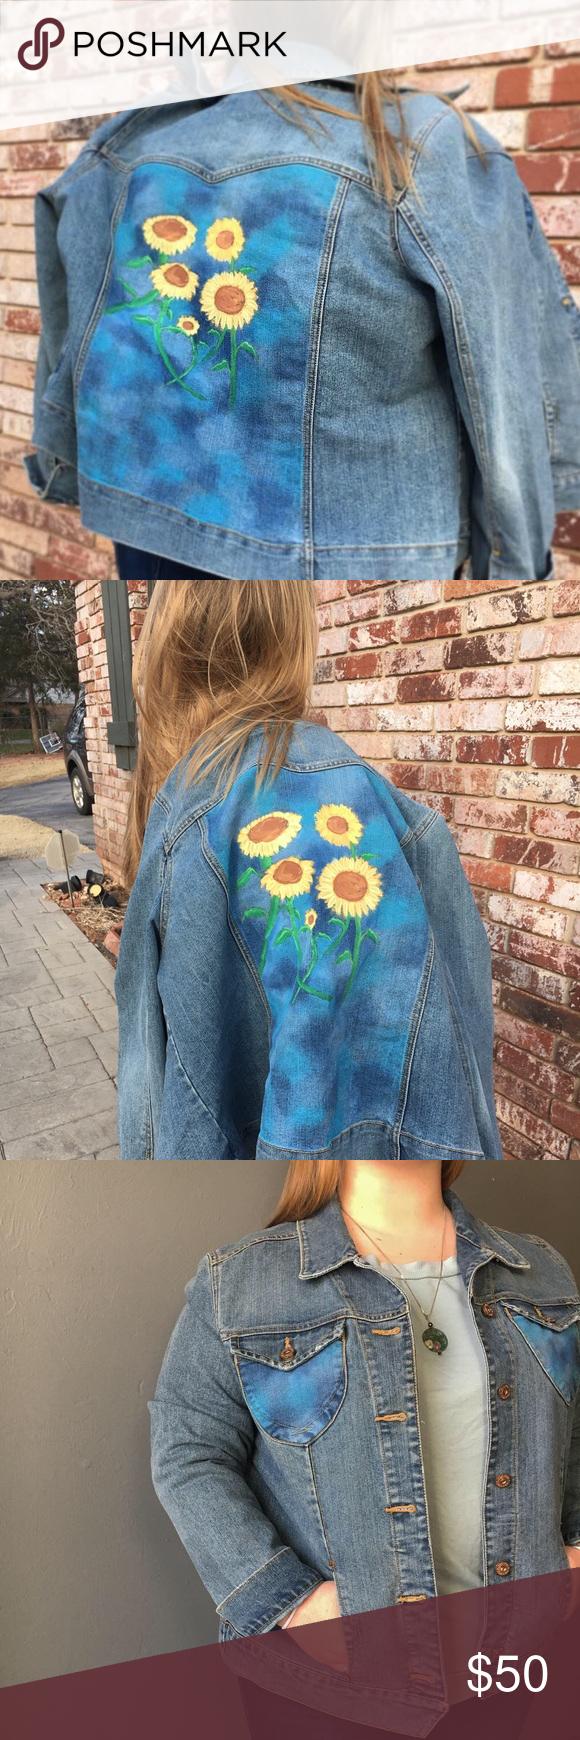 Hand Painted Sunflower Denim Jacket Denim Jacket Painted Jeans Jackets [ 1740 x 580 Pixel ]